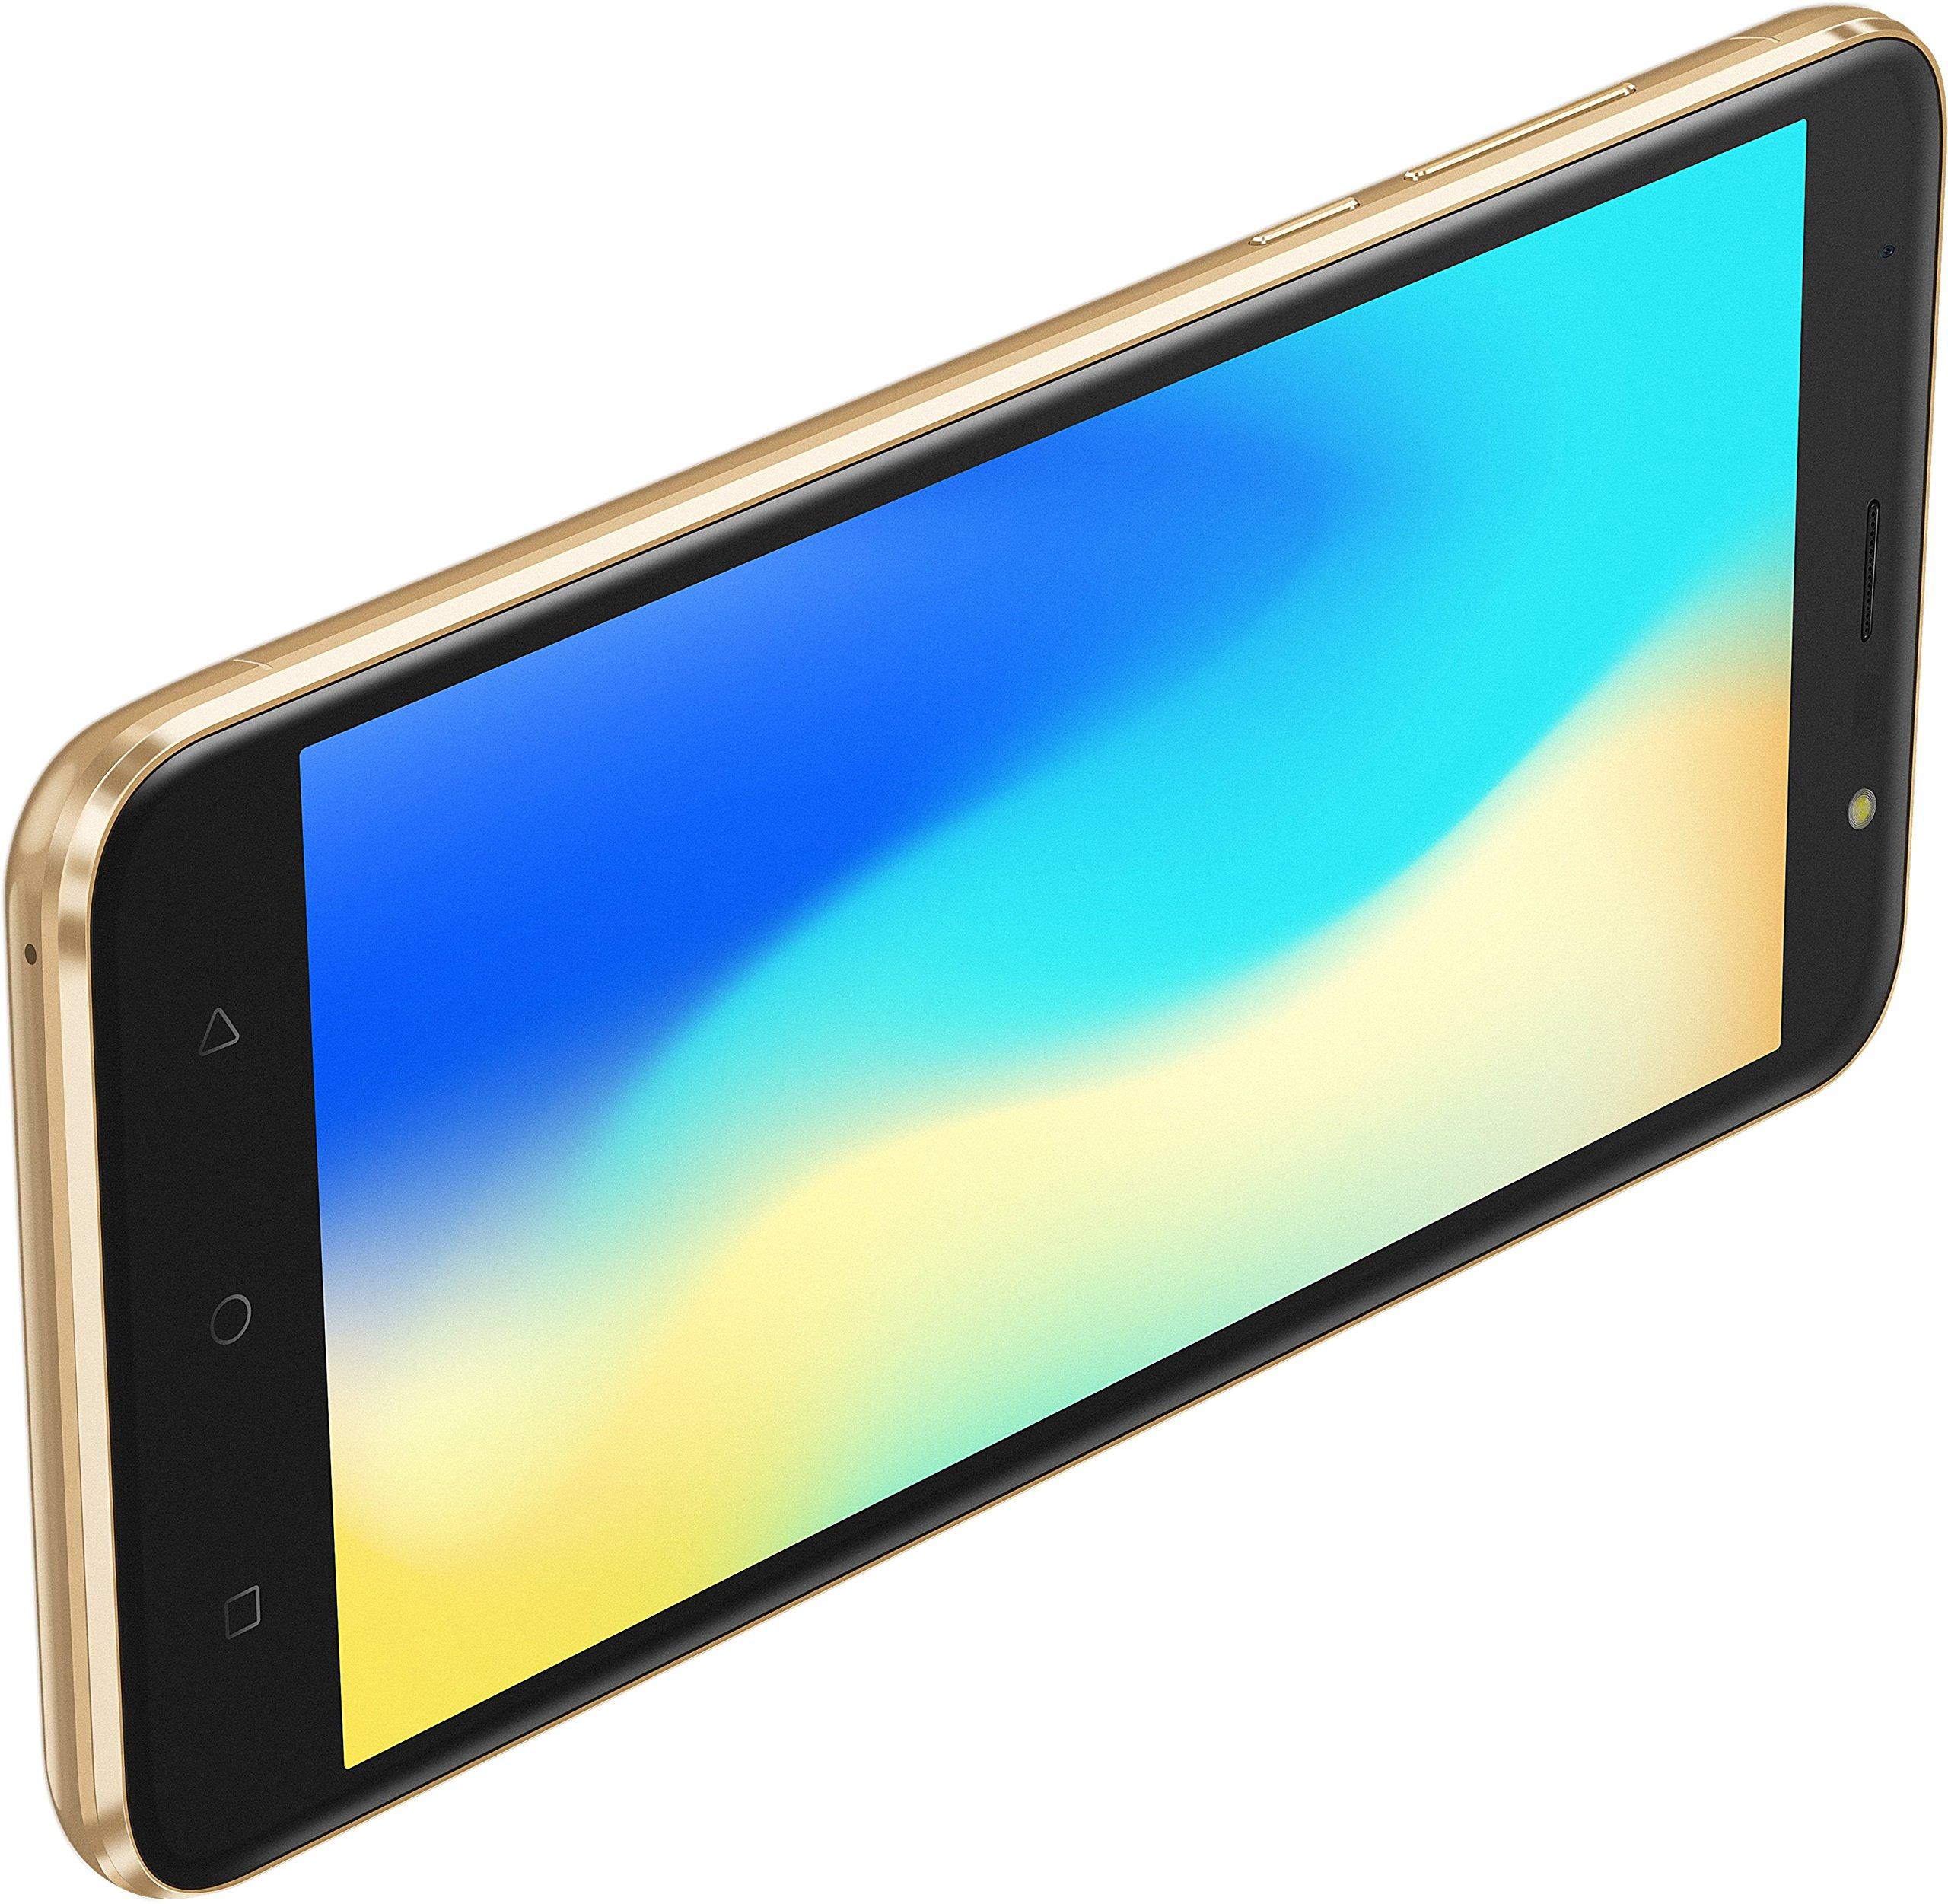 InnJoo Halo 5 3G - Smartphone de 5.5